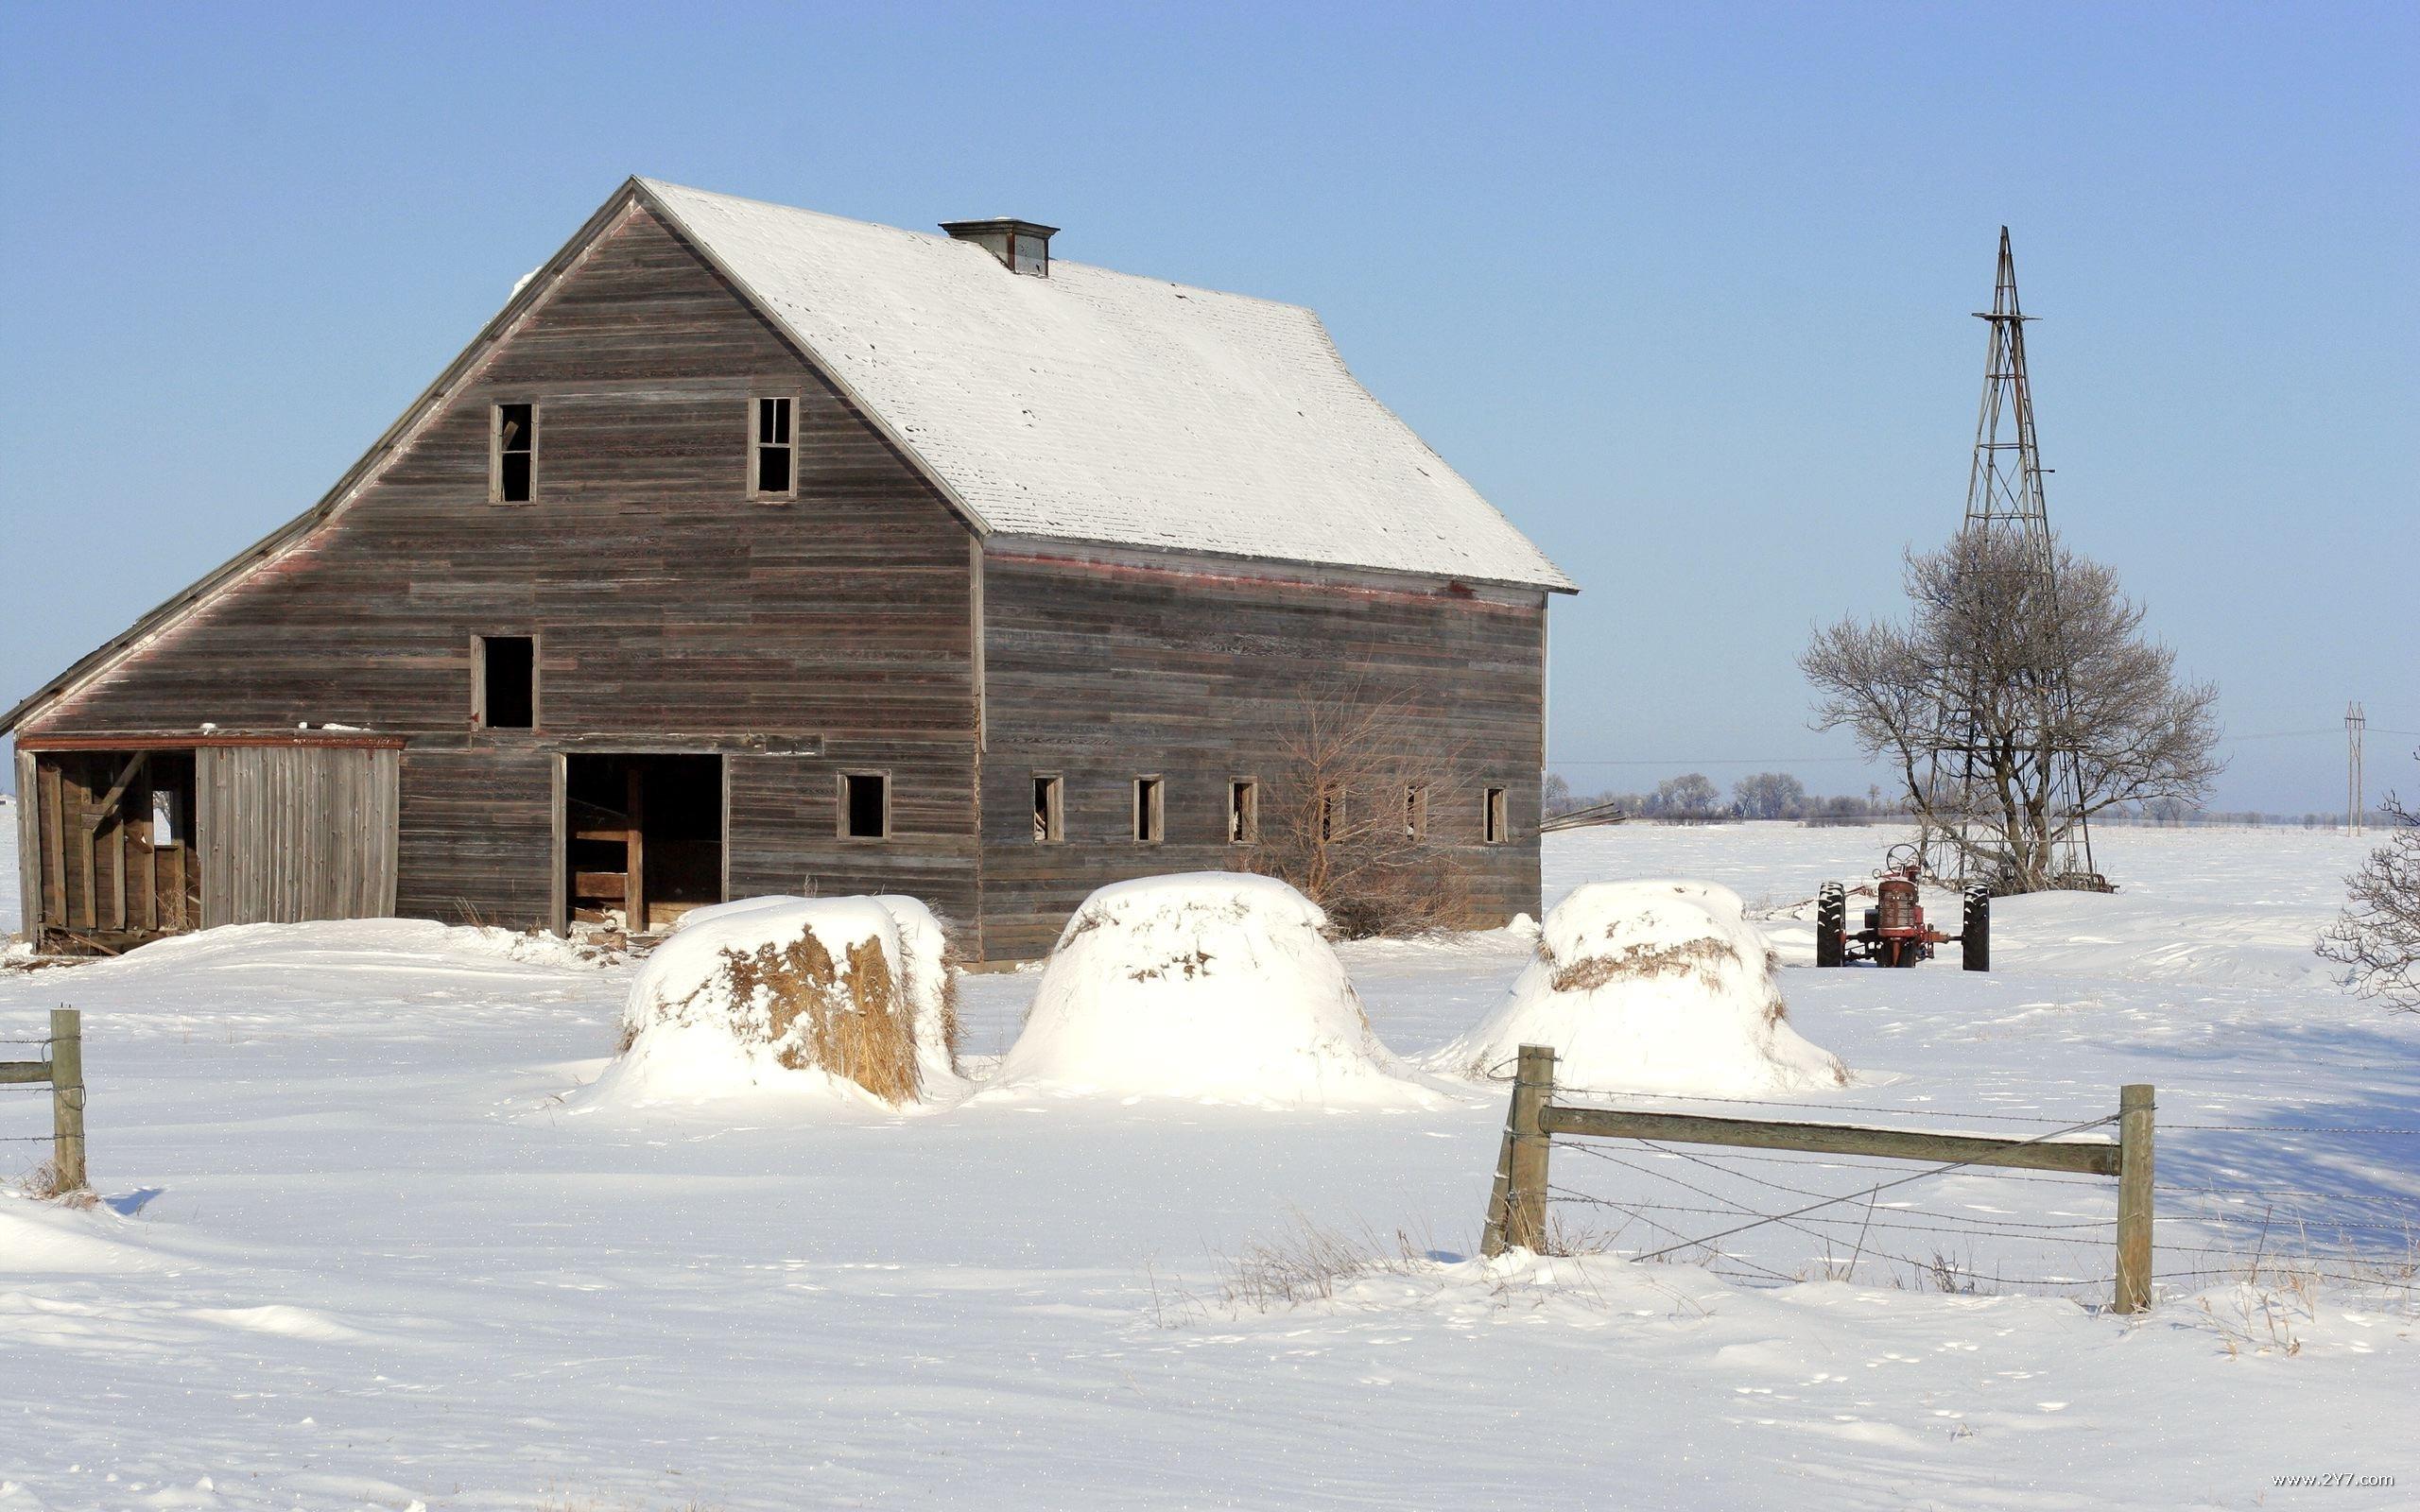 45+] Winter Barn Scenes Wallpaper on ...